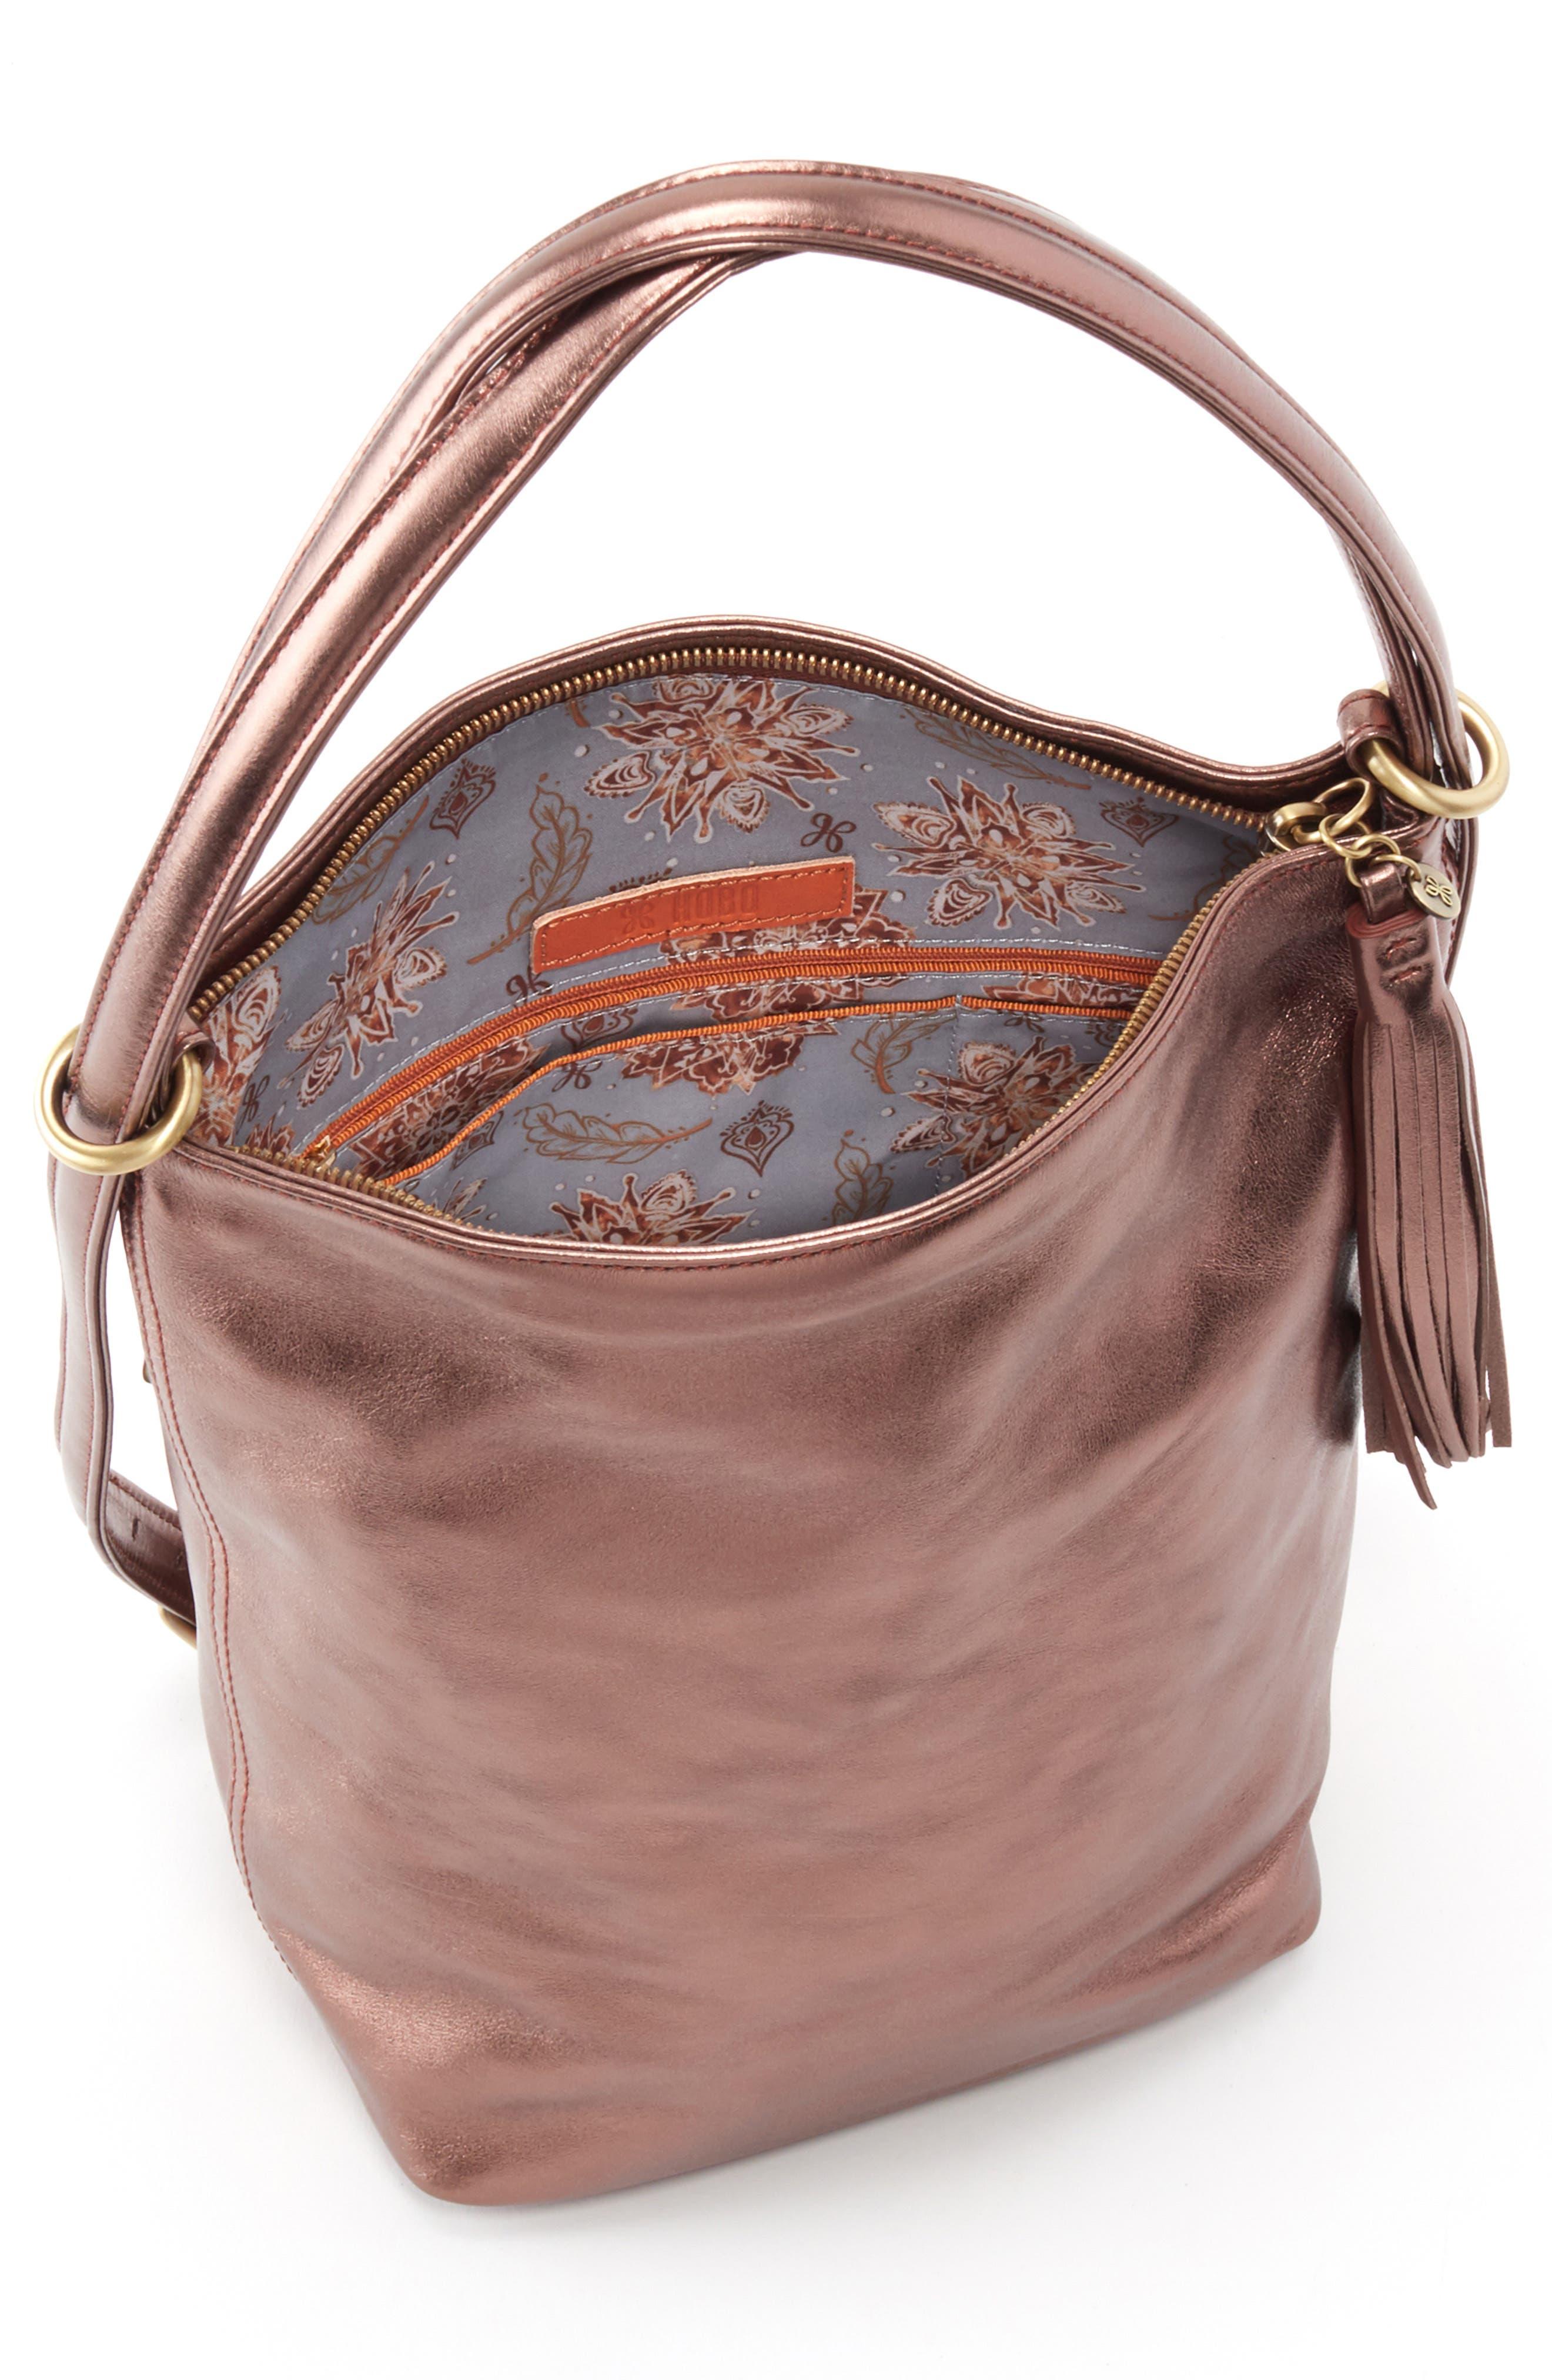 Blaze Convertible Shoulder Bag,                             Alternate thumbnail 3, color,                             246